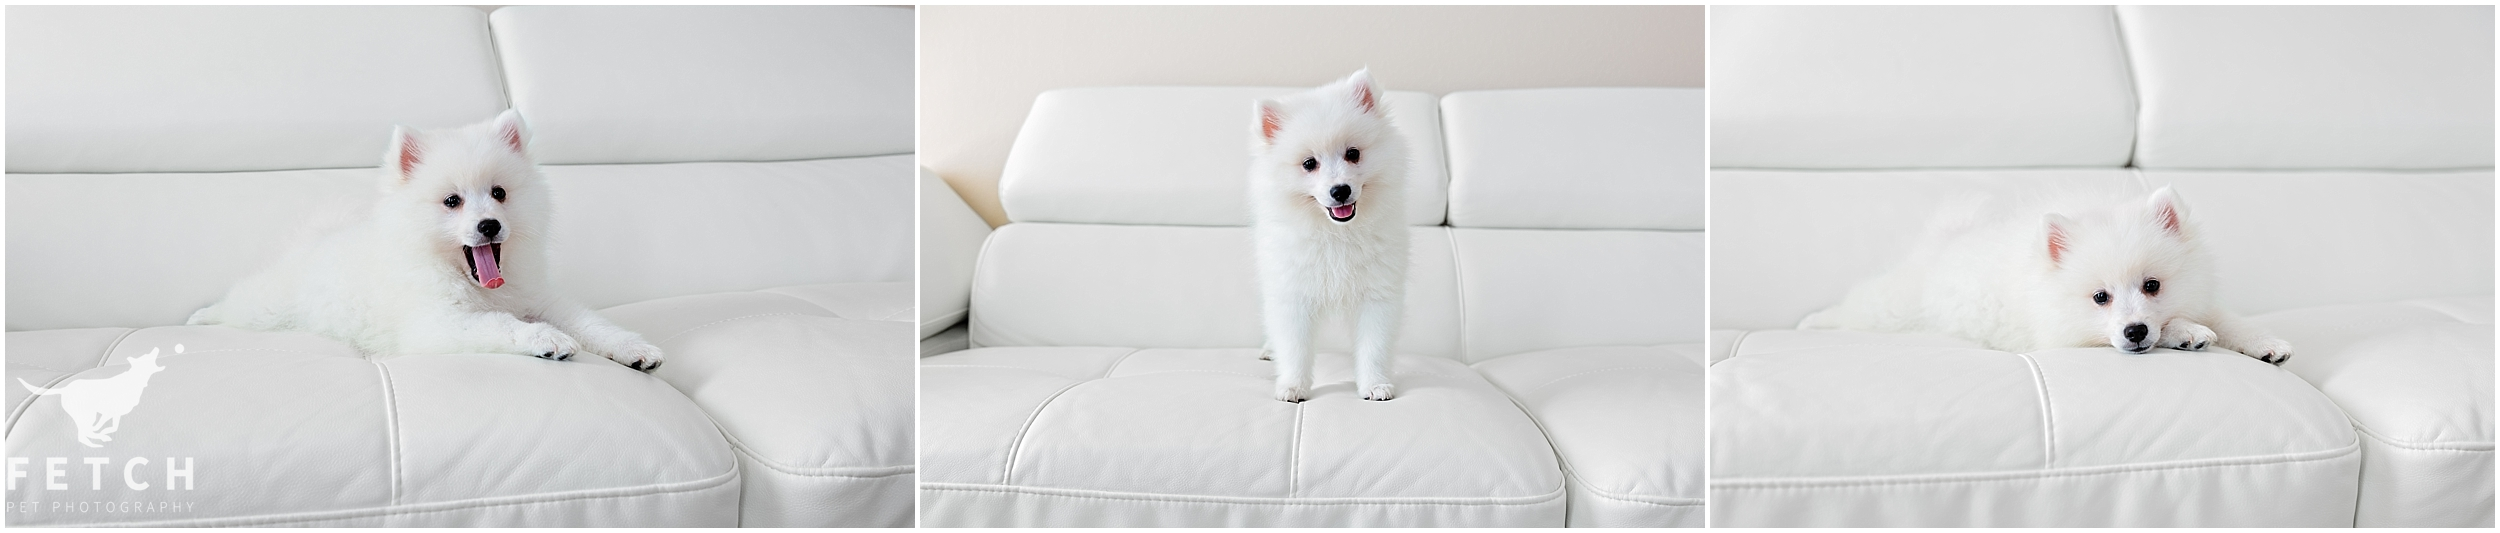 american-eskimo-dog-puppy